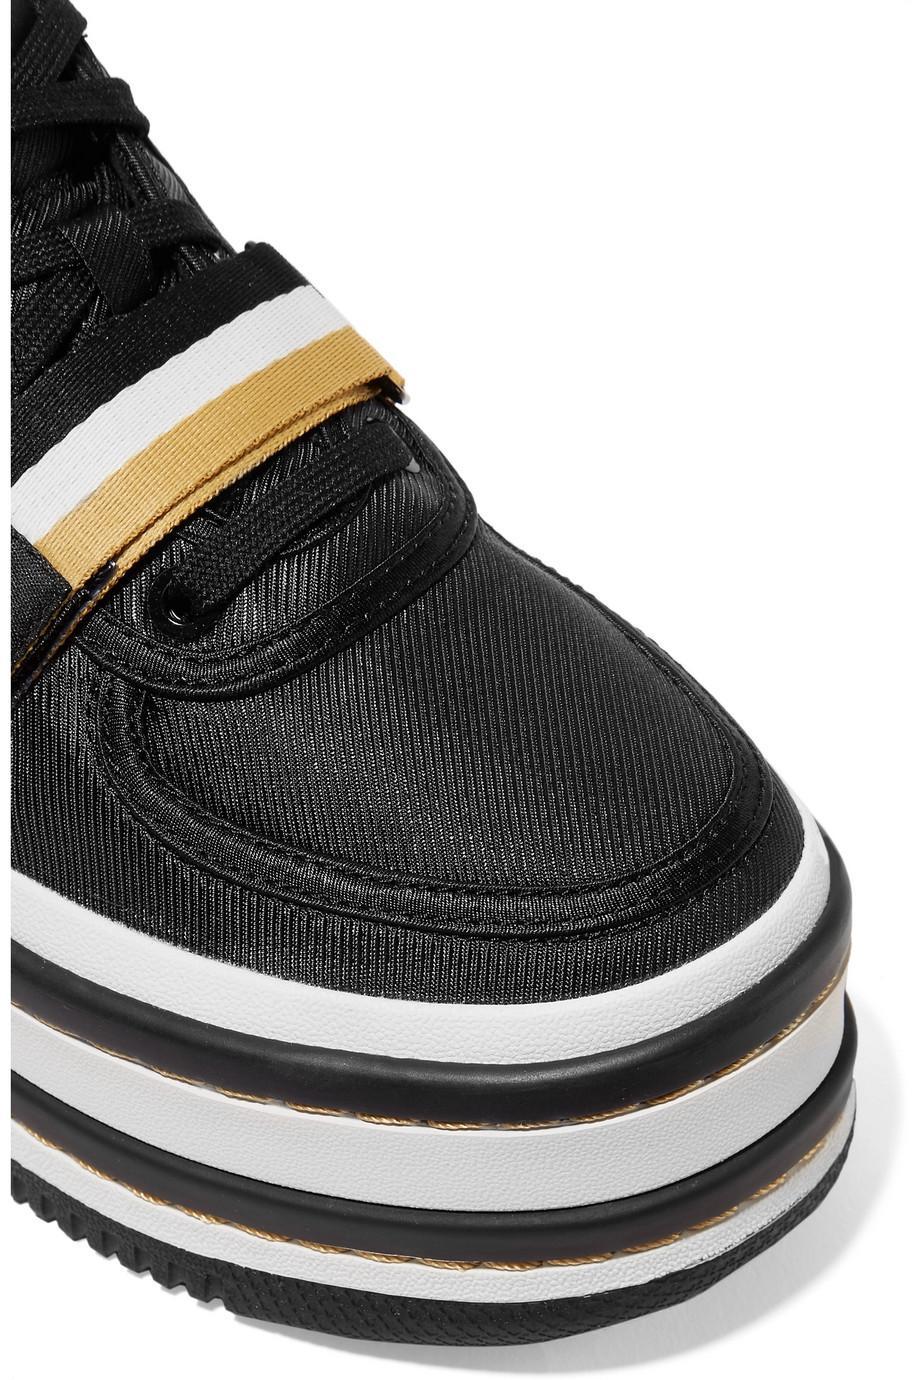 c546ae618122 Lyst - Nike Vandal 2k Metallic Faux Leather-trimmed Faille Platform ...